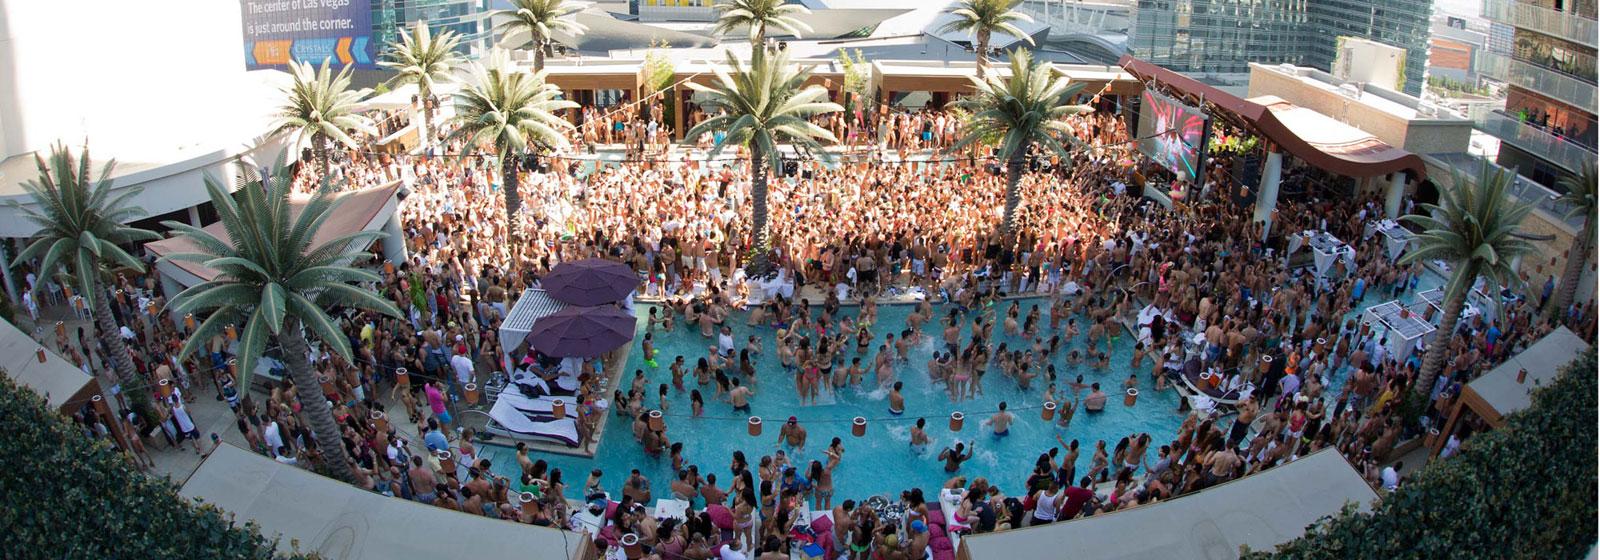 Las Vegas Pool Parties Schedule 2019 | Dayclub Event Tickets